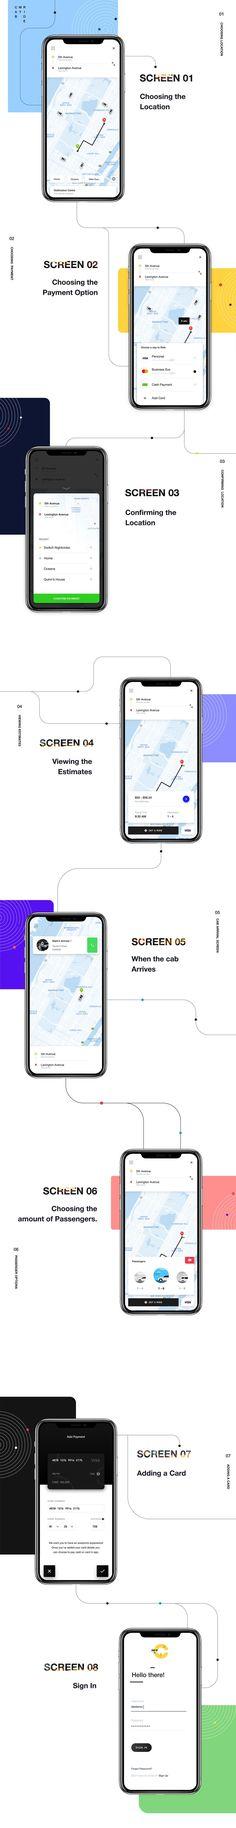 App mockup Interface Design, Ui Design, Icon Design, Graphic Design, Advert Design, Design Tutorials, Mobile App, Mockup, Advertising